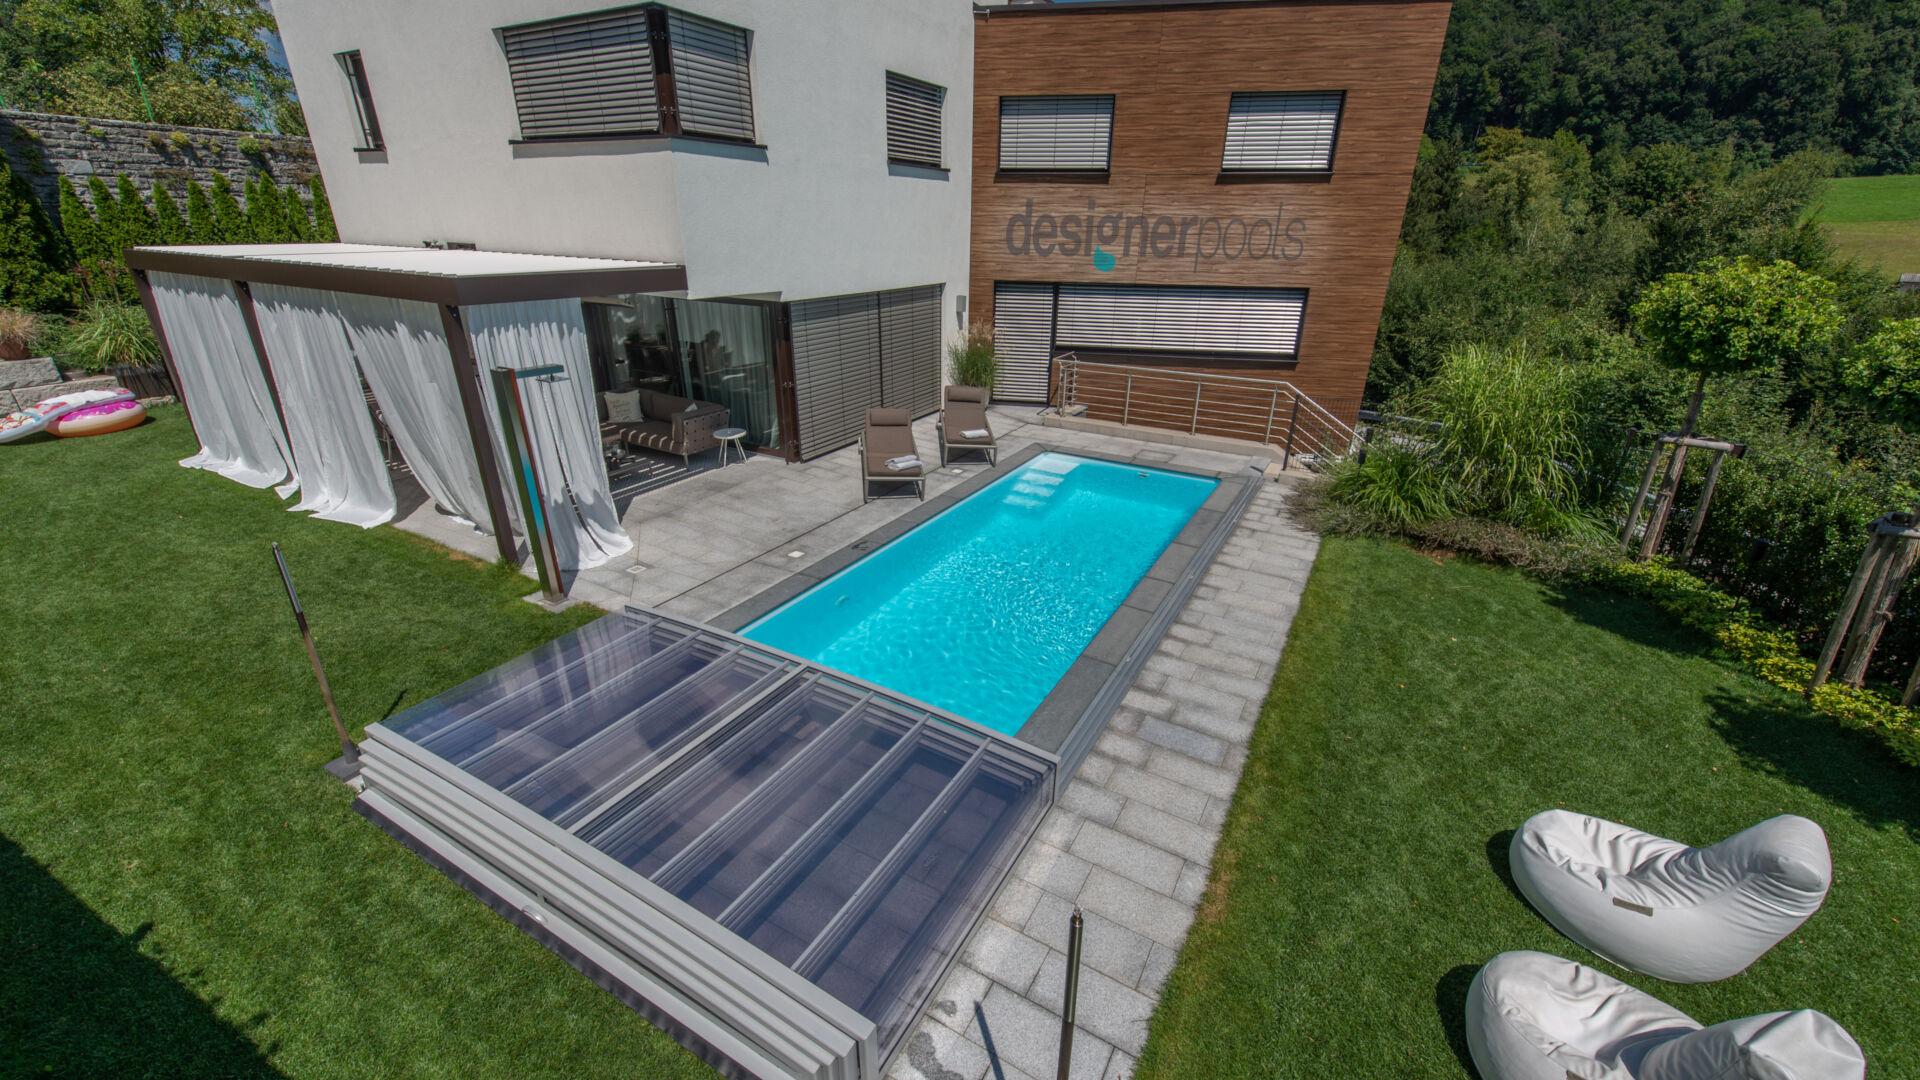 Pool-Überdachung - designerpools